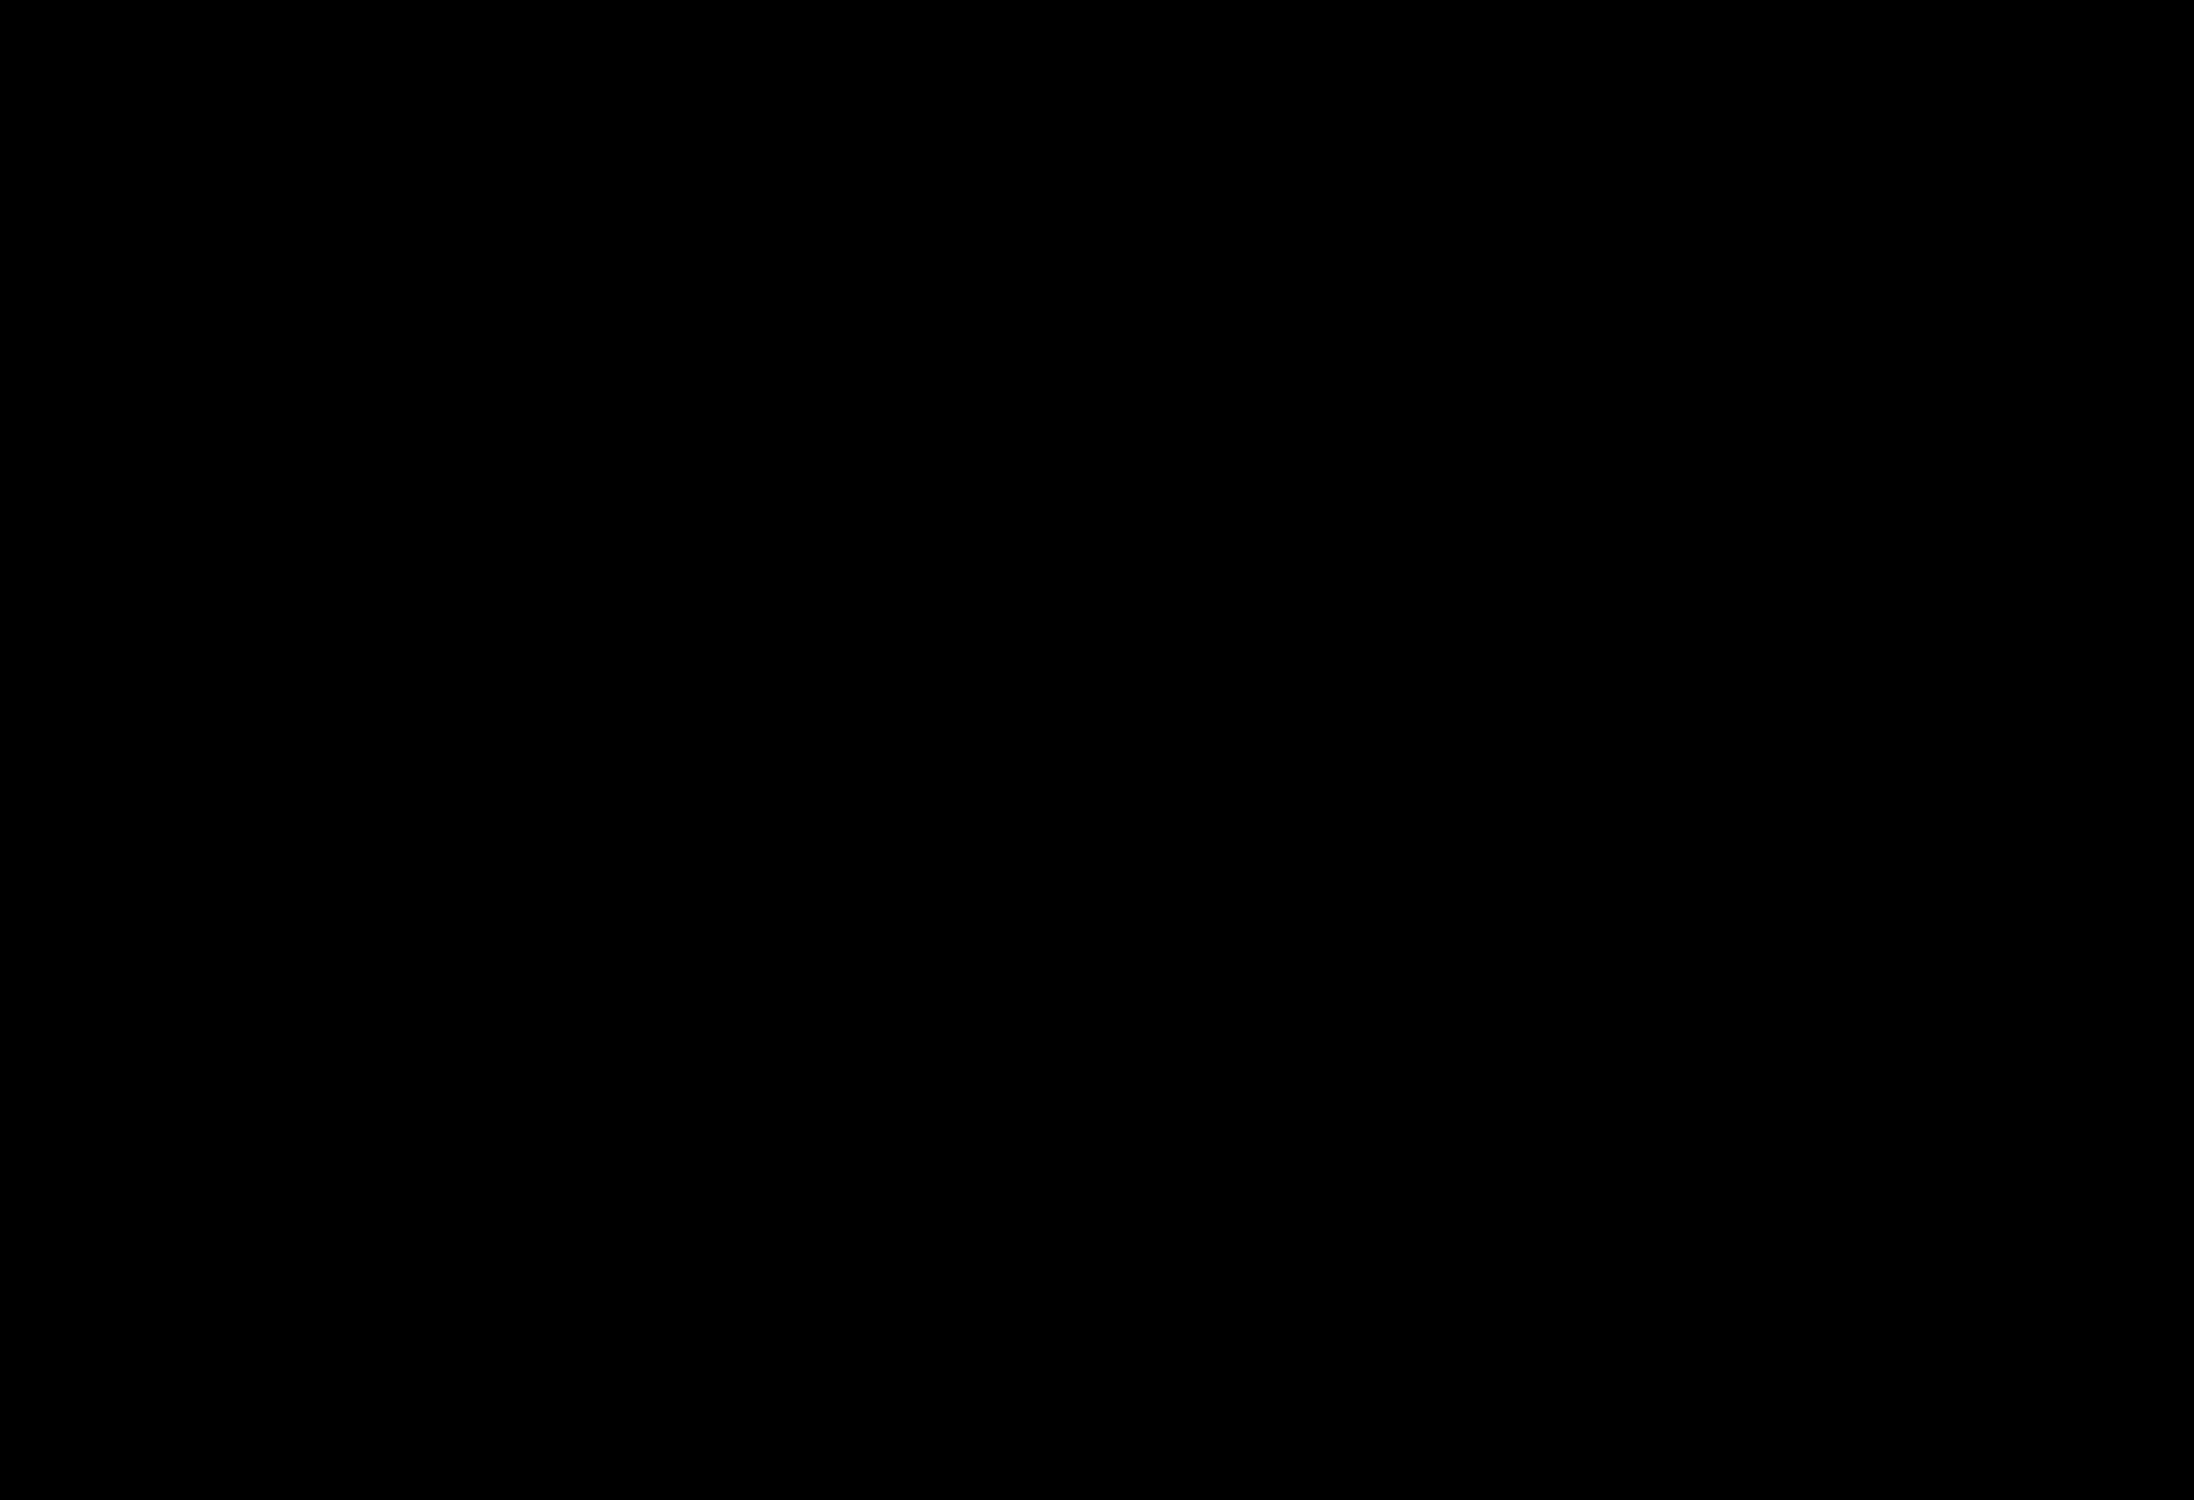 Zivid-One-IP65-Liquid